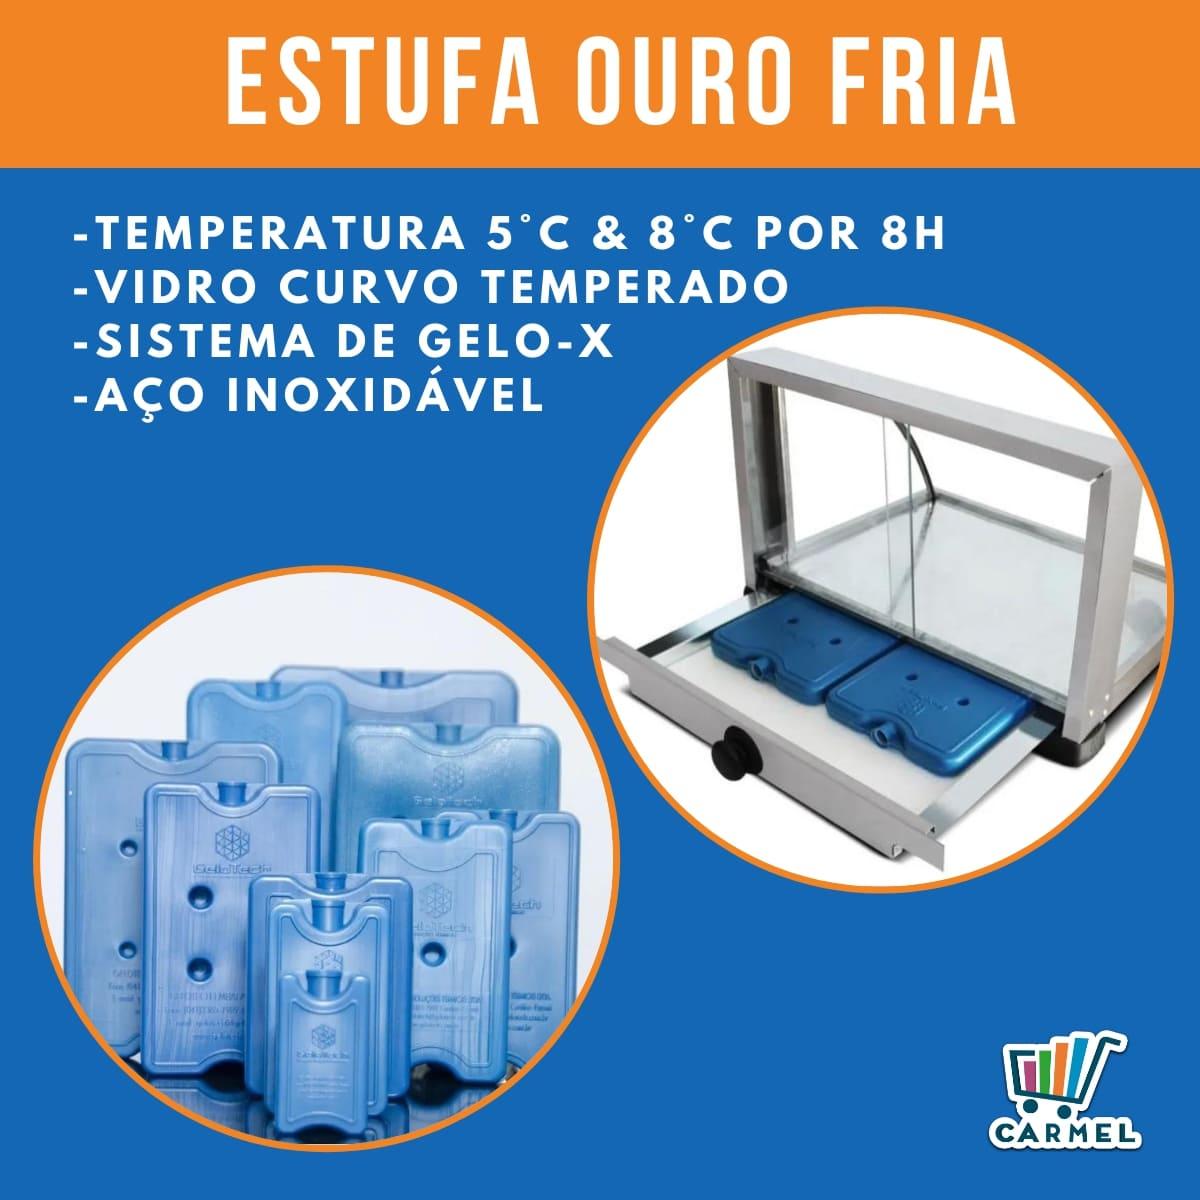 Estufa Fria c/ 8 Gelo-X Marchesoni 68 Cm - Ef7040  - Carmel Equipamentos